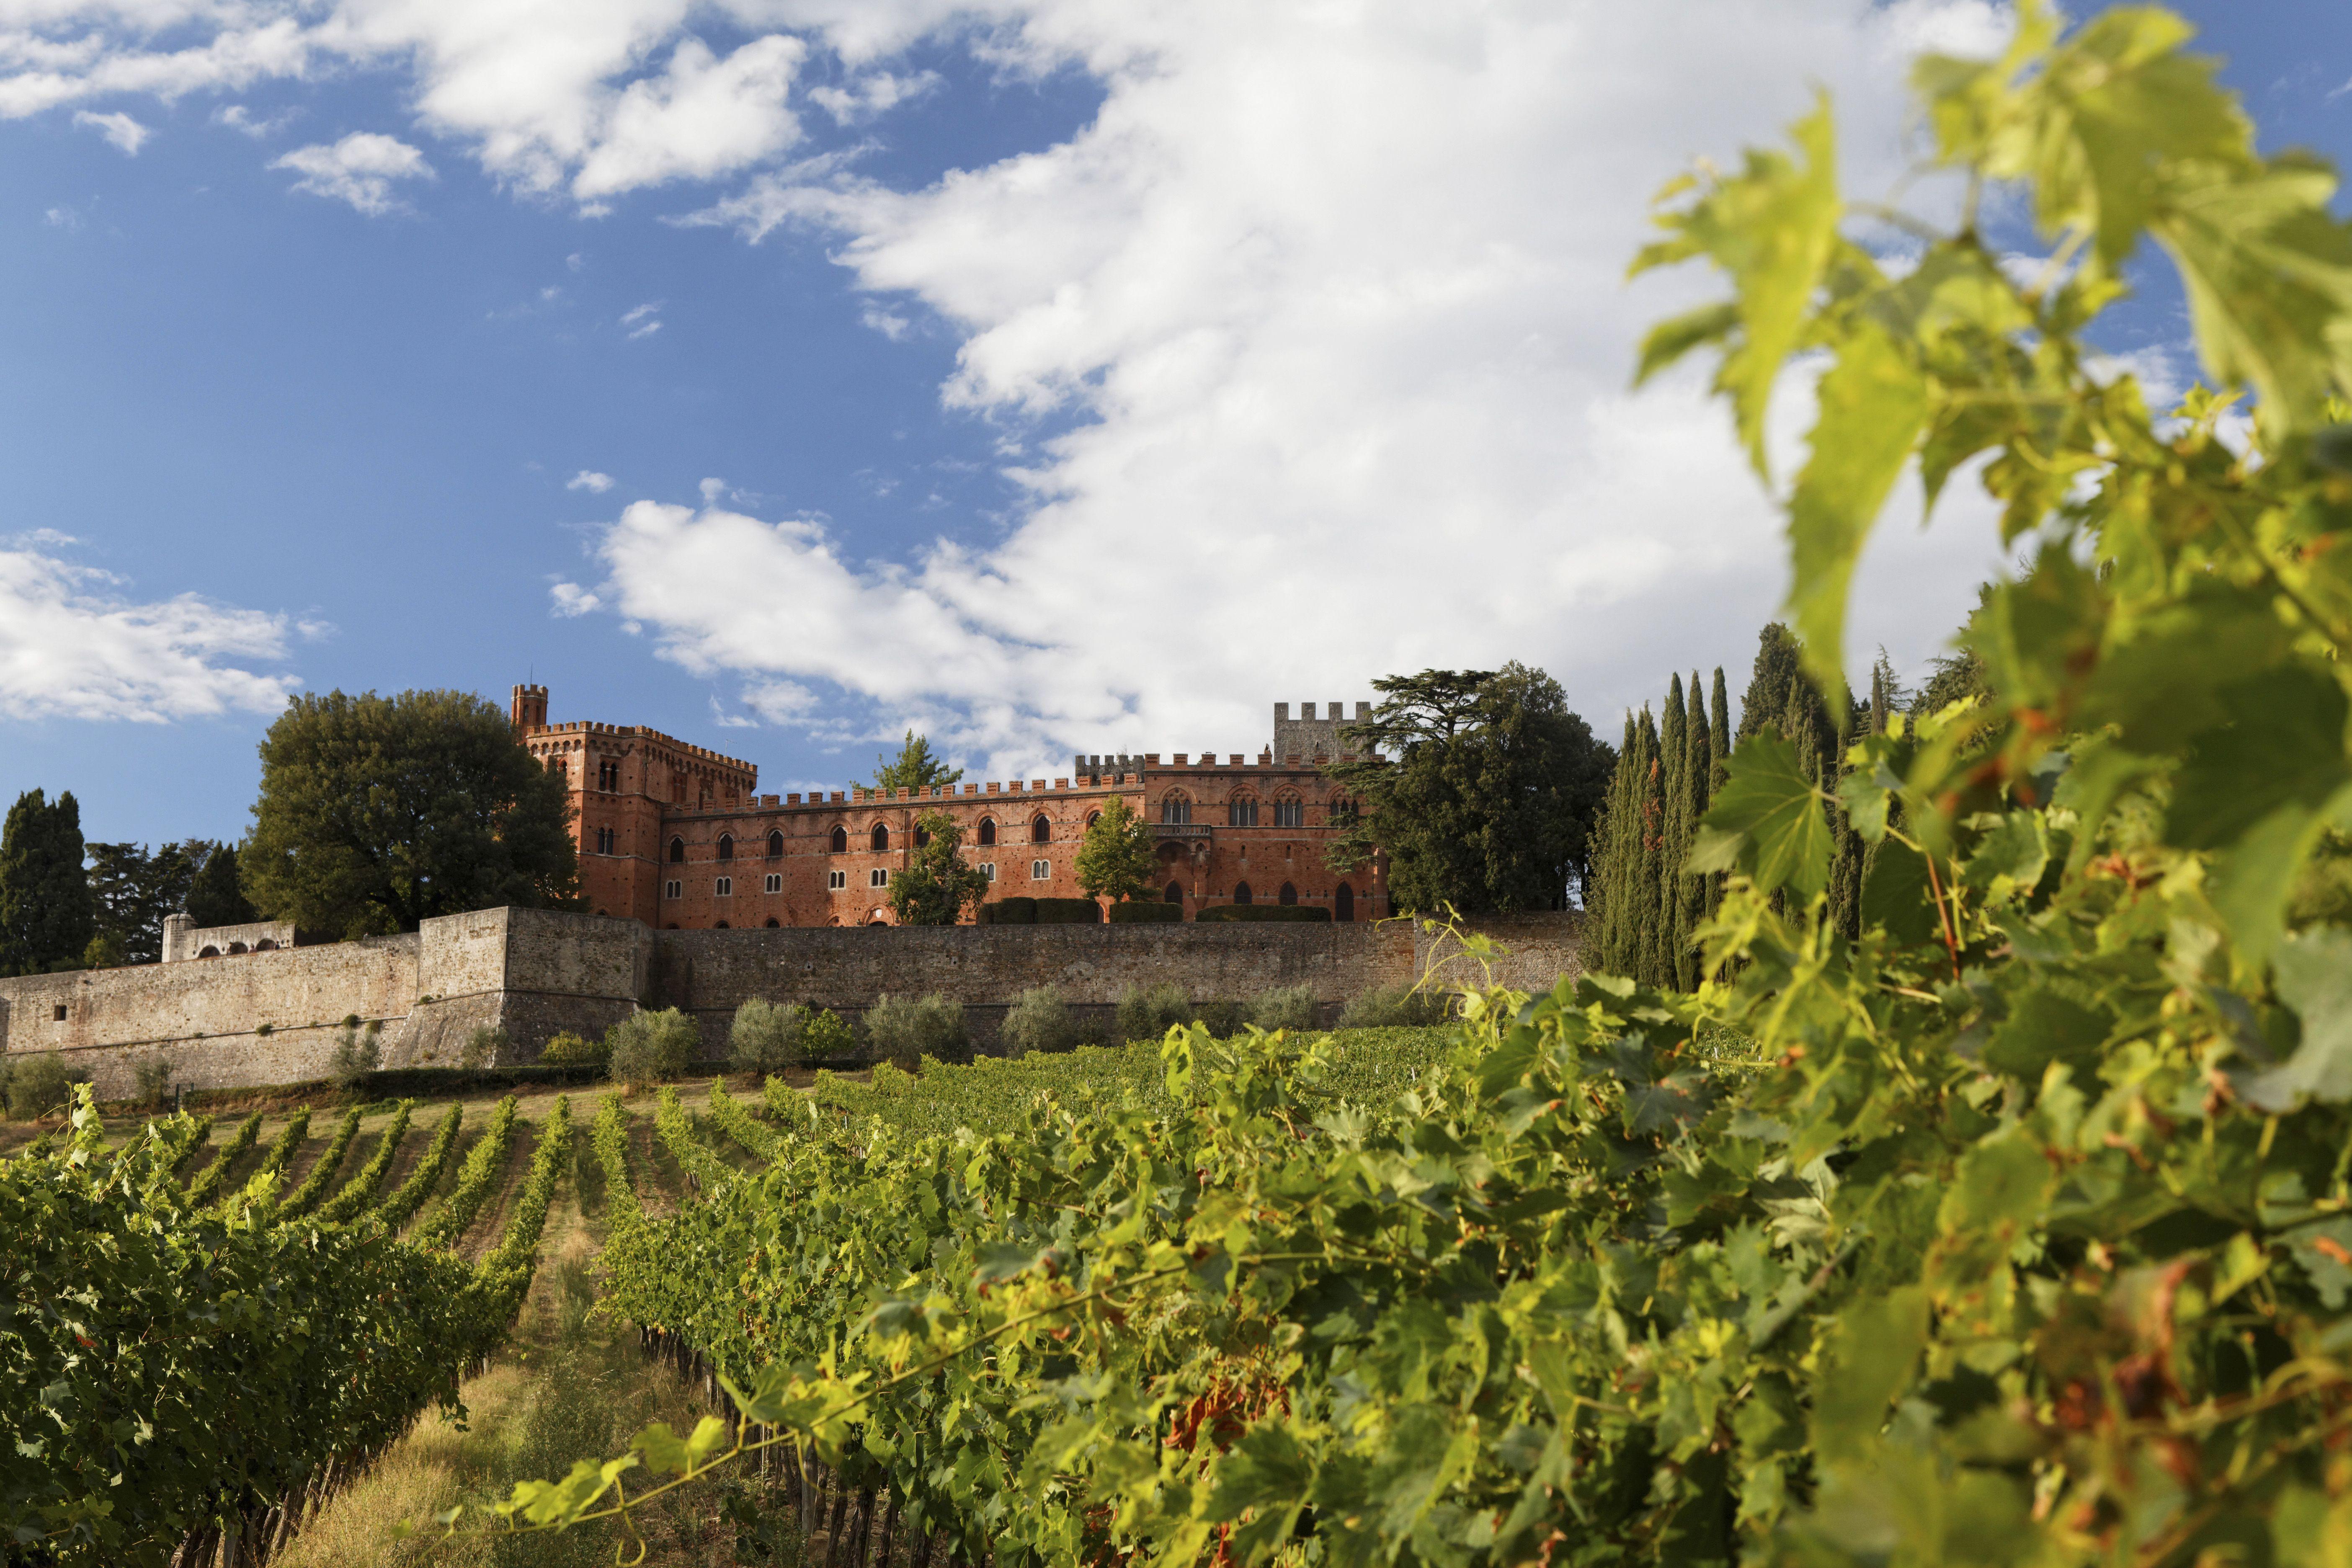 Castello di Bolio, the oldest Tuscan winery, Gaiole in Chianti, Tuscany, Italy